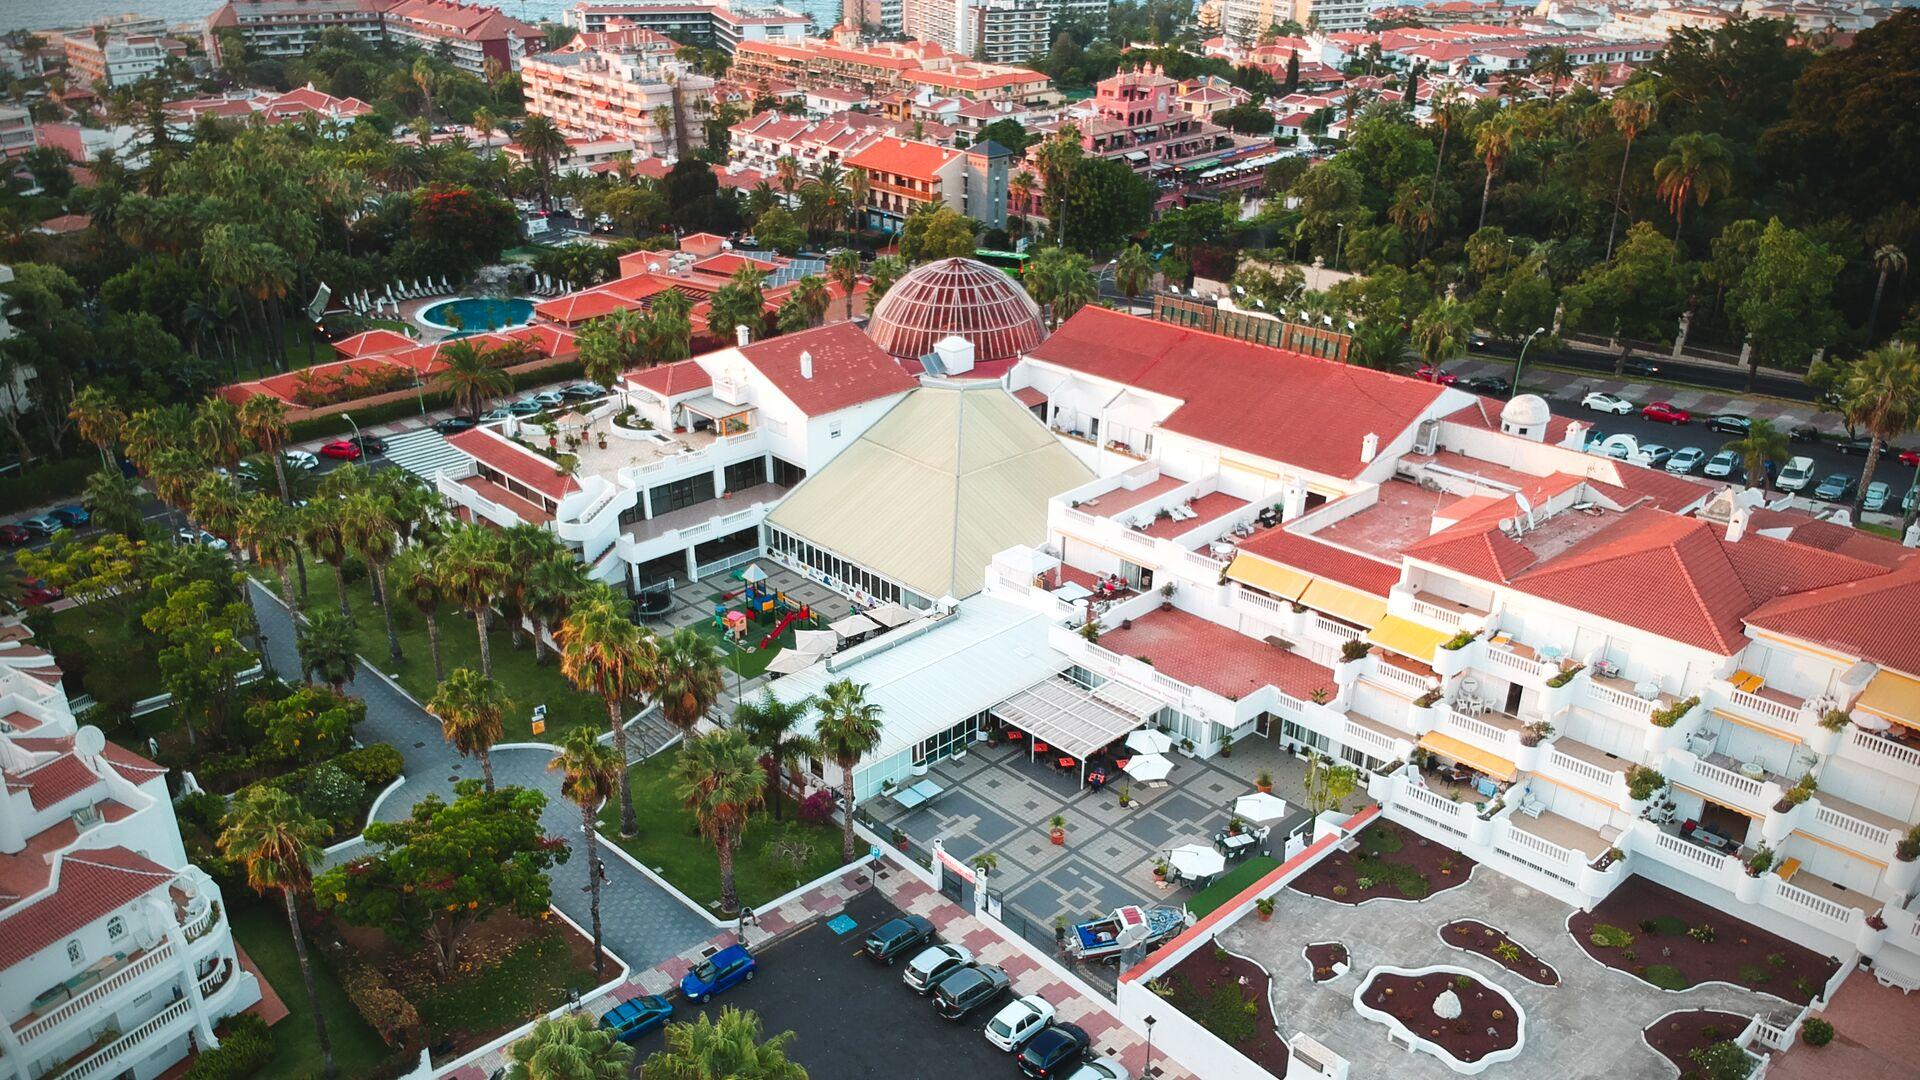 Sprachaufenthalt Spanien, Teneriffa - FU International Academy Tenerife - Schule